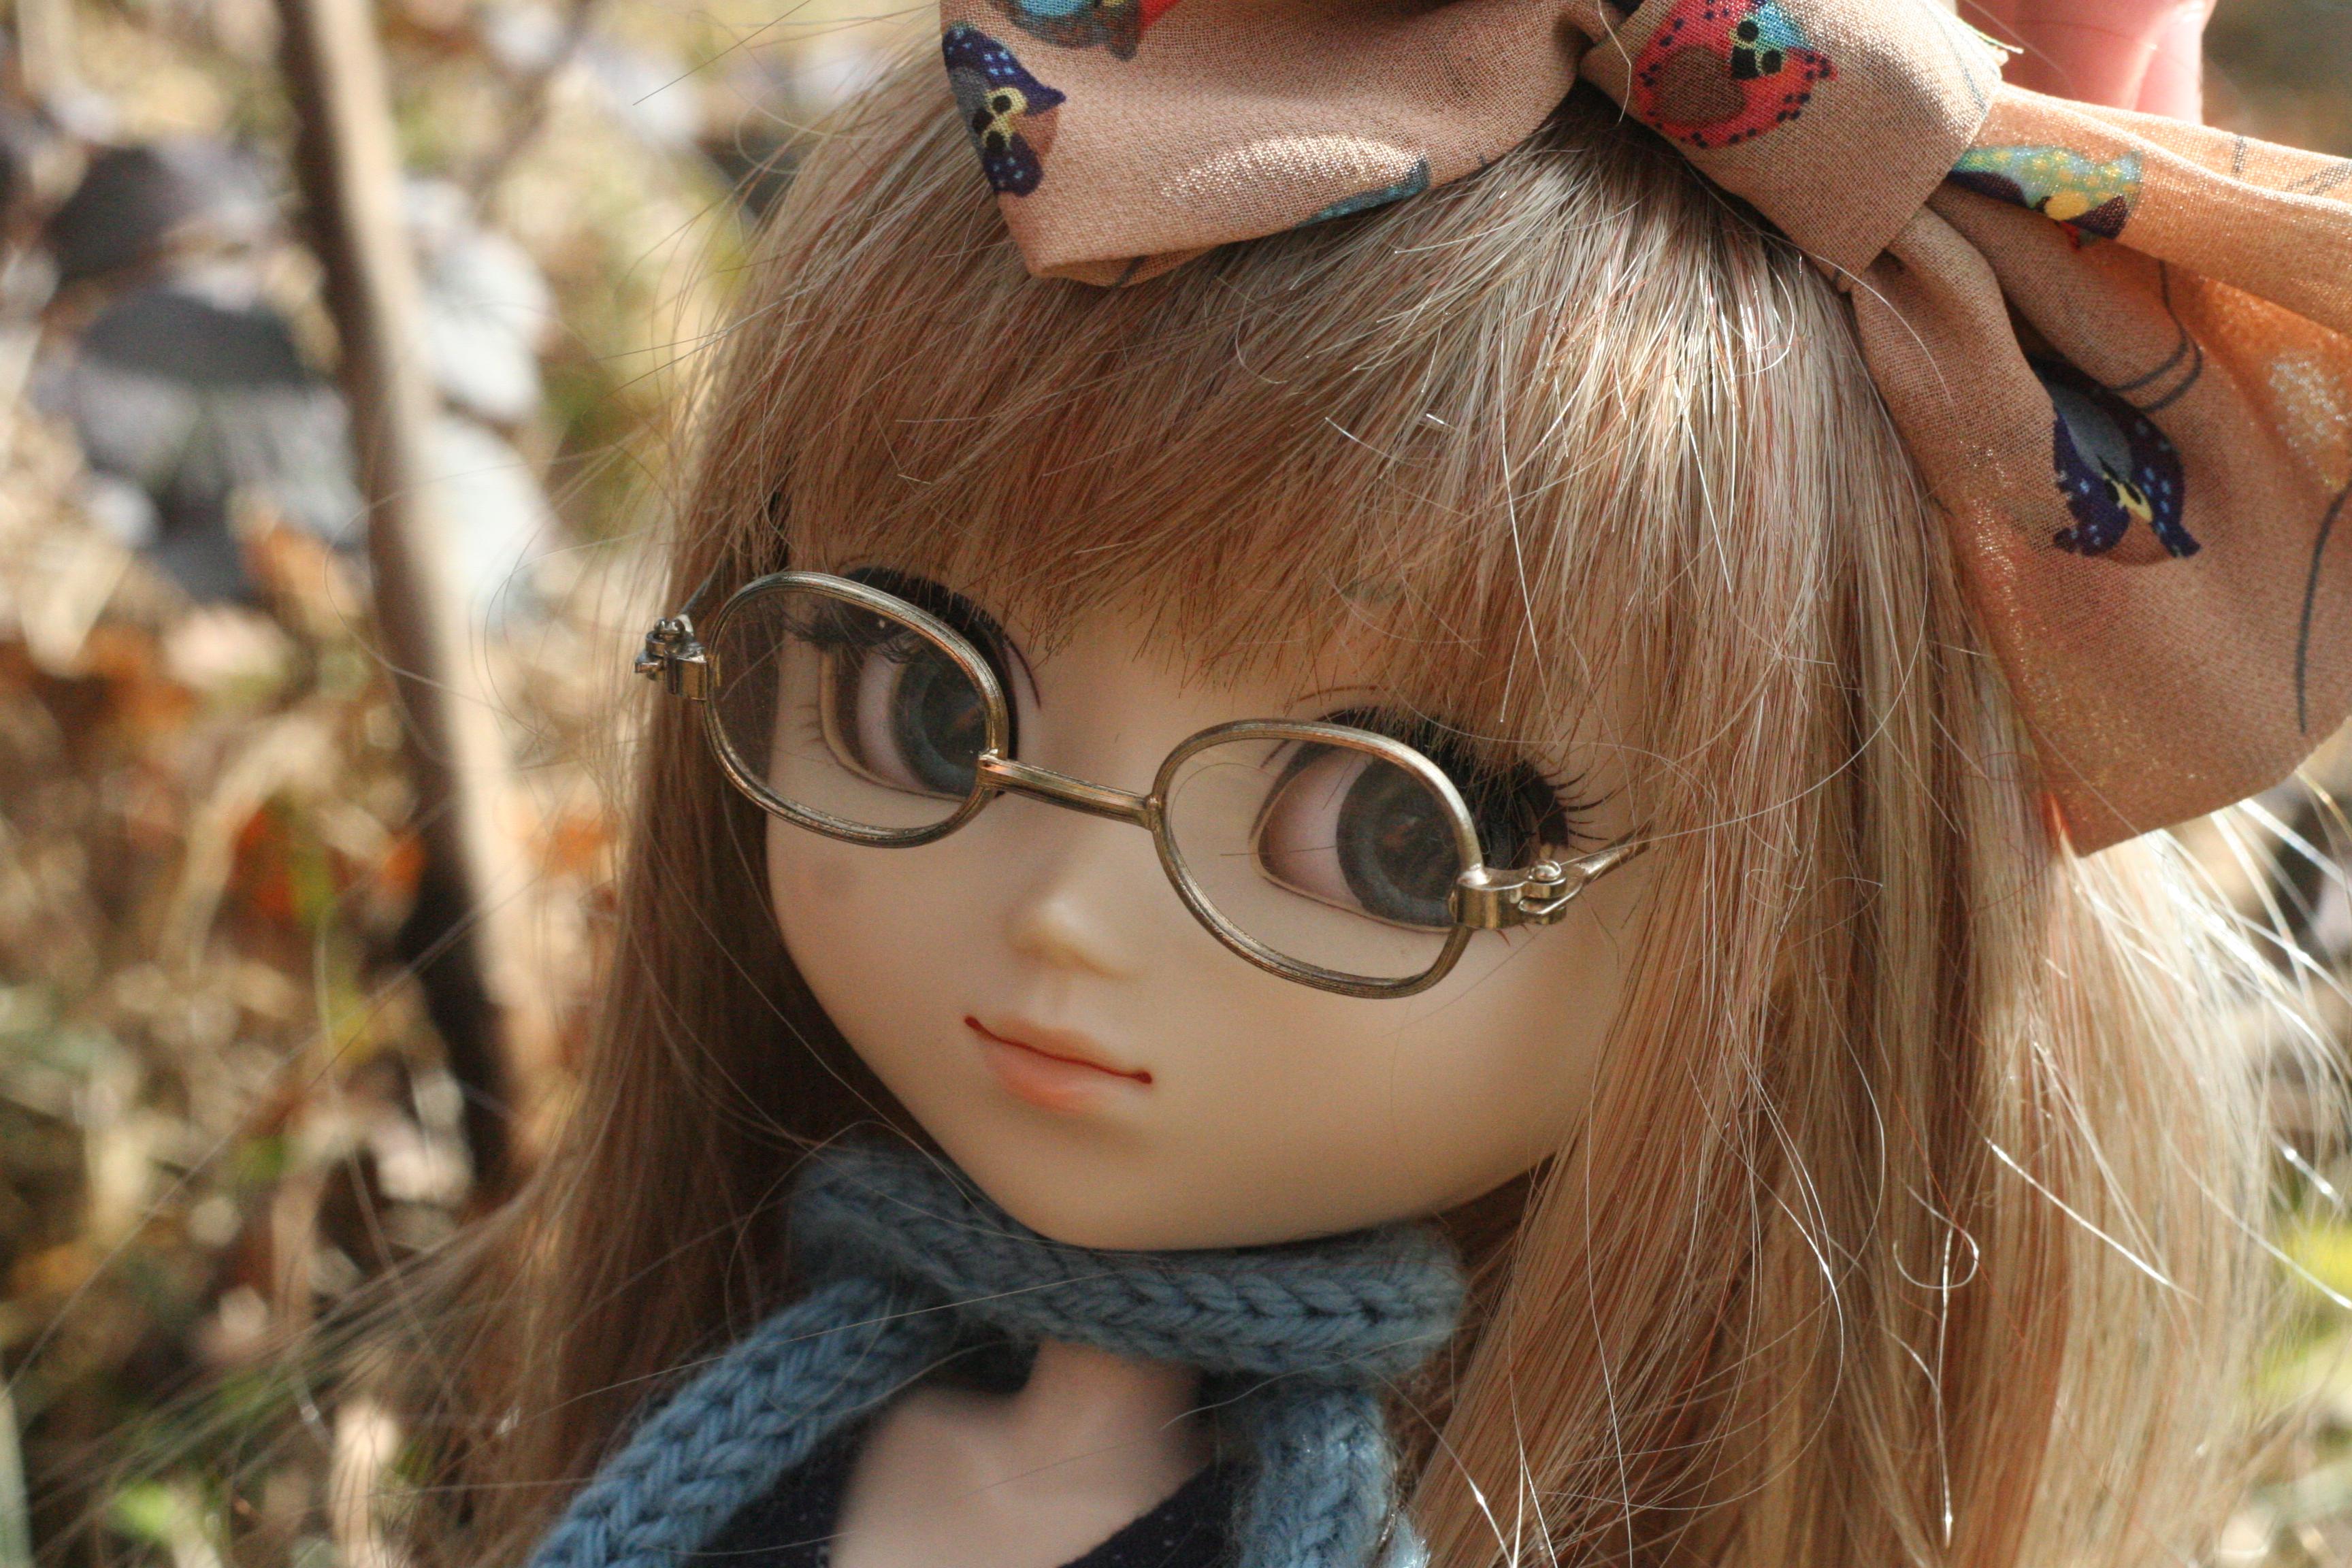 Wallpaper Animal Glasses Eyes Dress Blond Wig Owl Ribbon Pullip Neo Angelique Scraf 3456x2304 1092430 Hd Wallpapers Wallhere